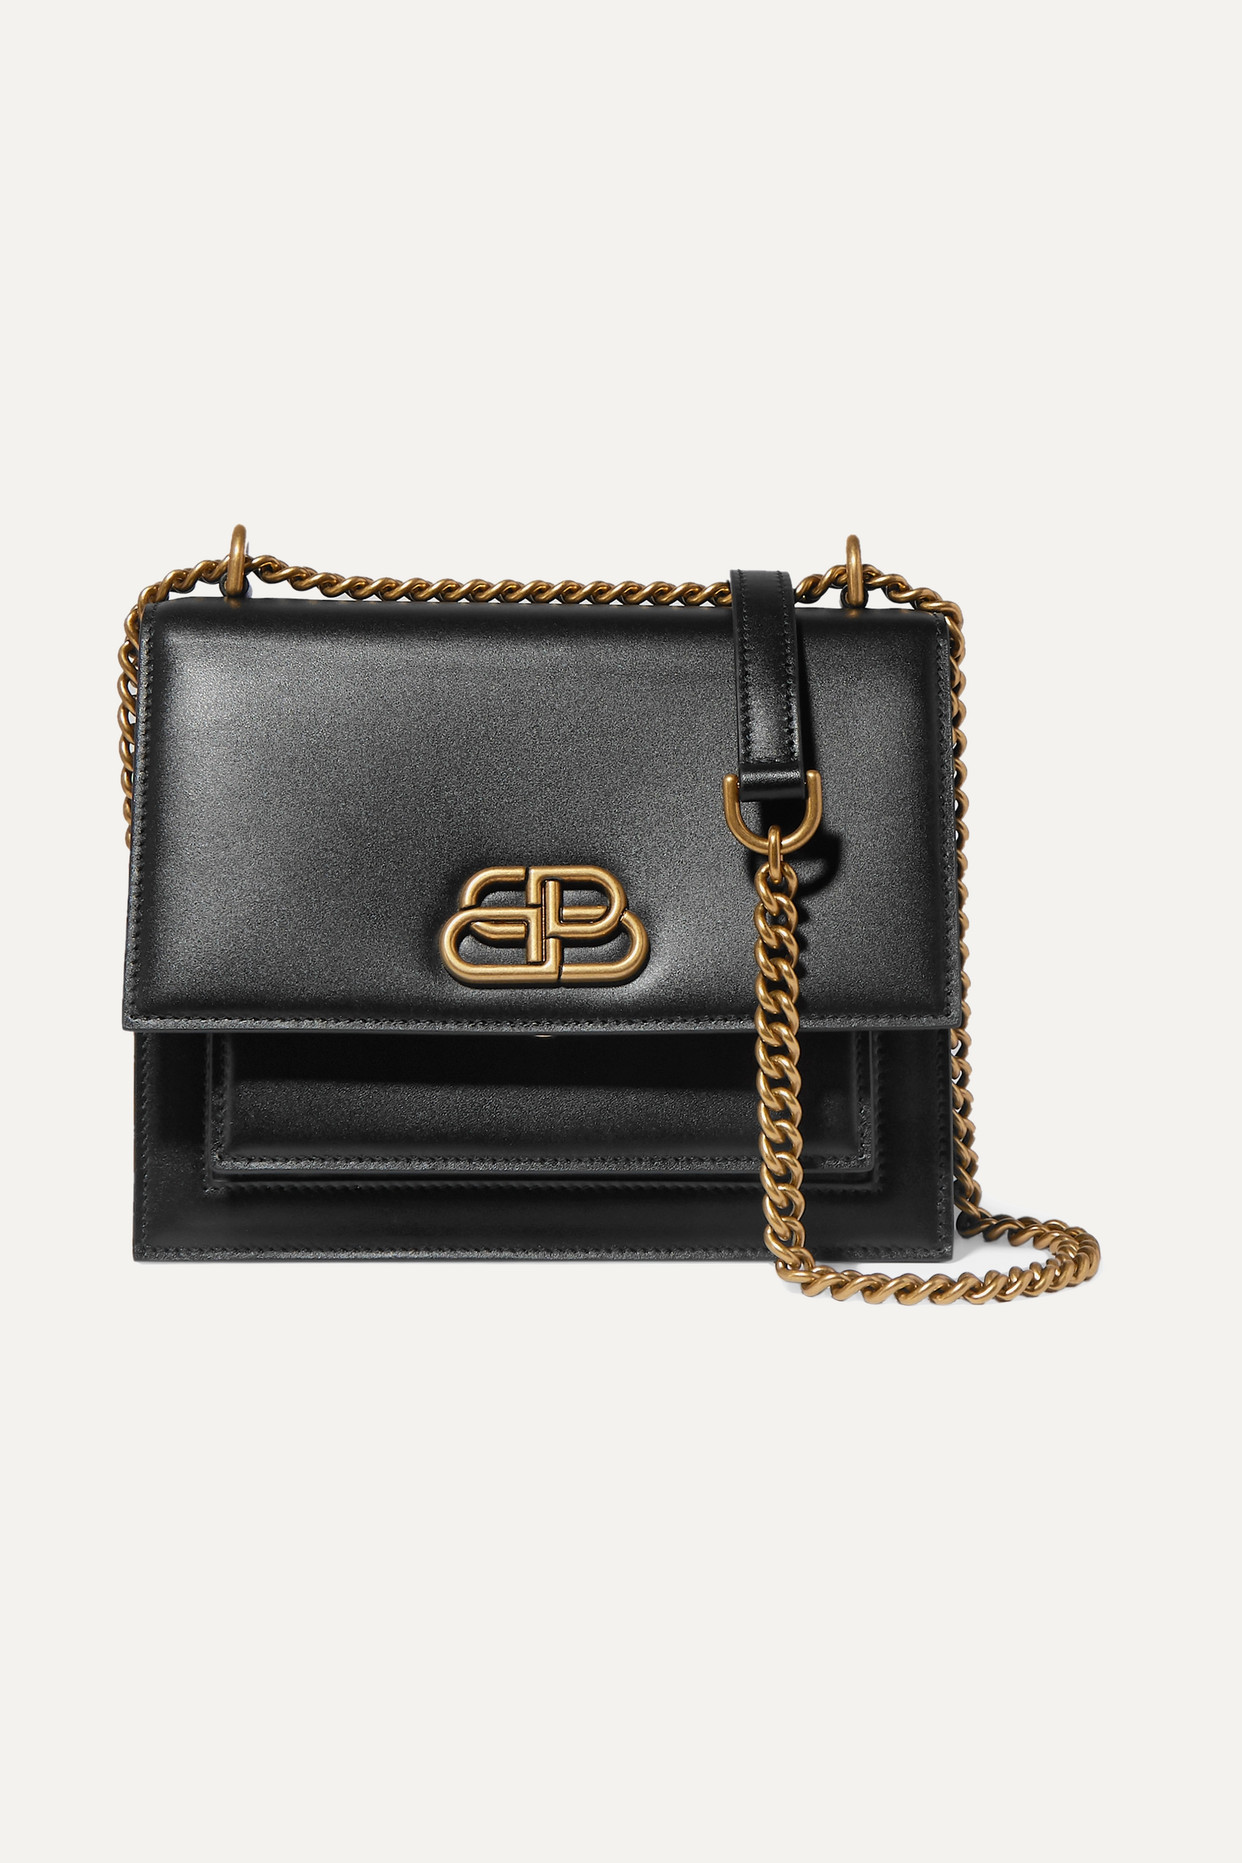 BALENCIAGA - Sharp S Leather Shoulder Bag - Black - one size